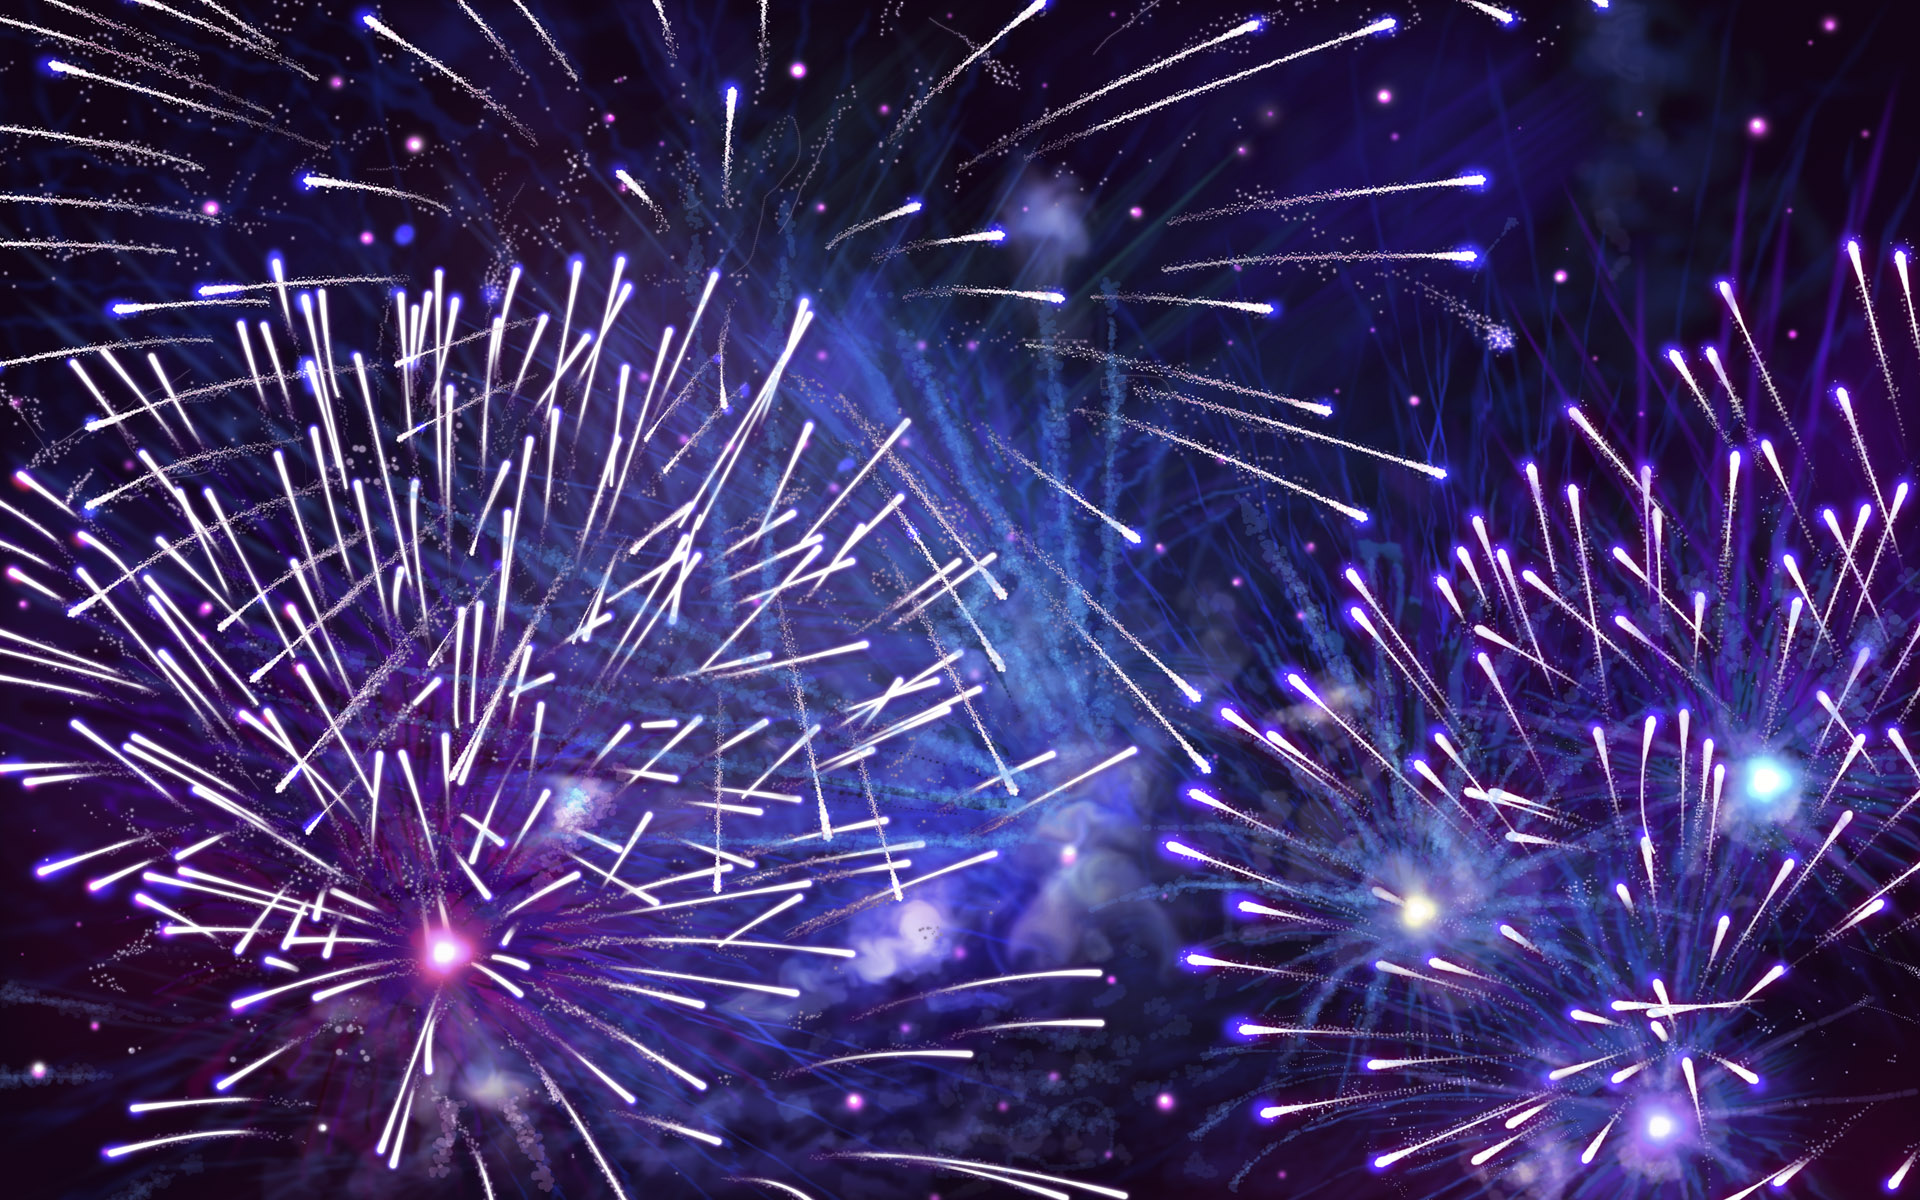 wallpaper happy desktop fireworks computer years images 1920x1200